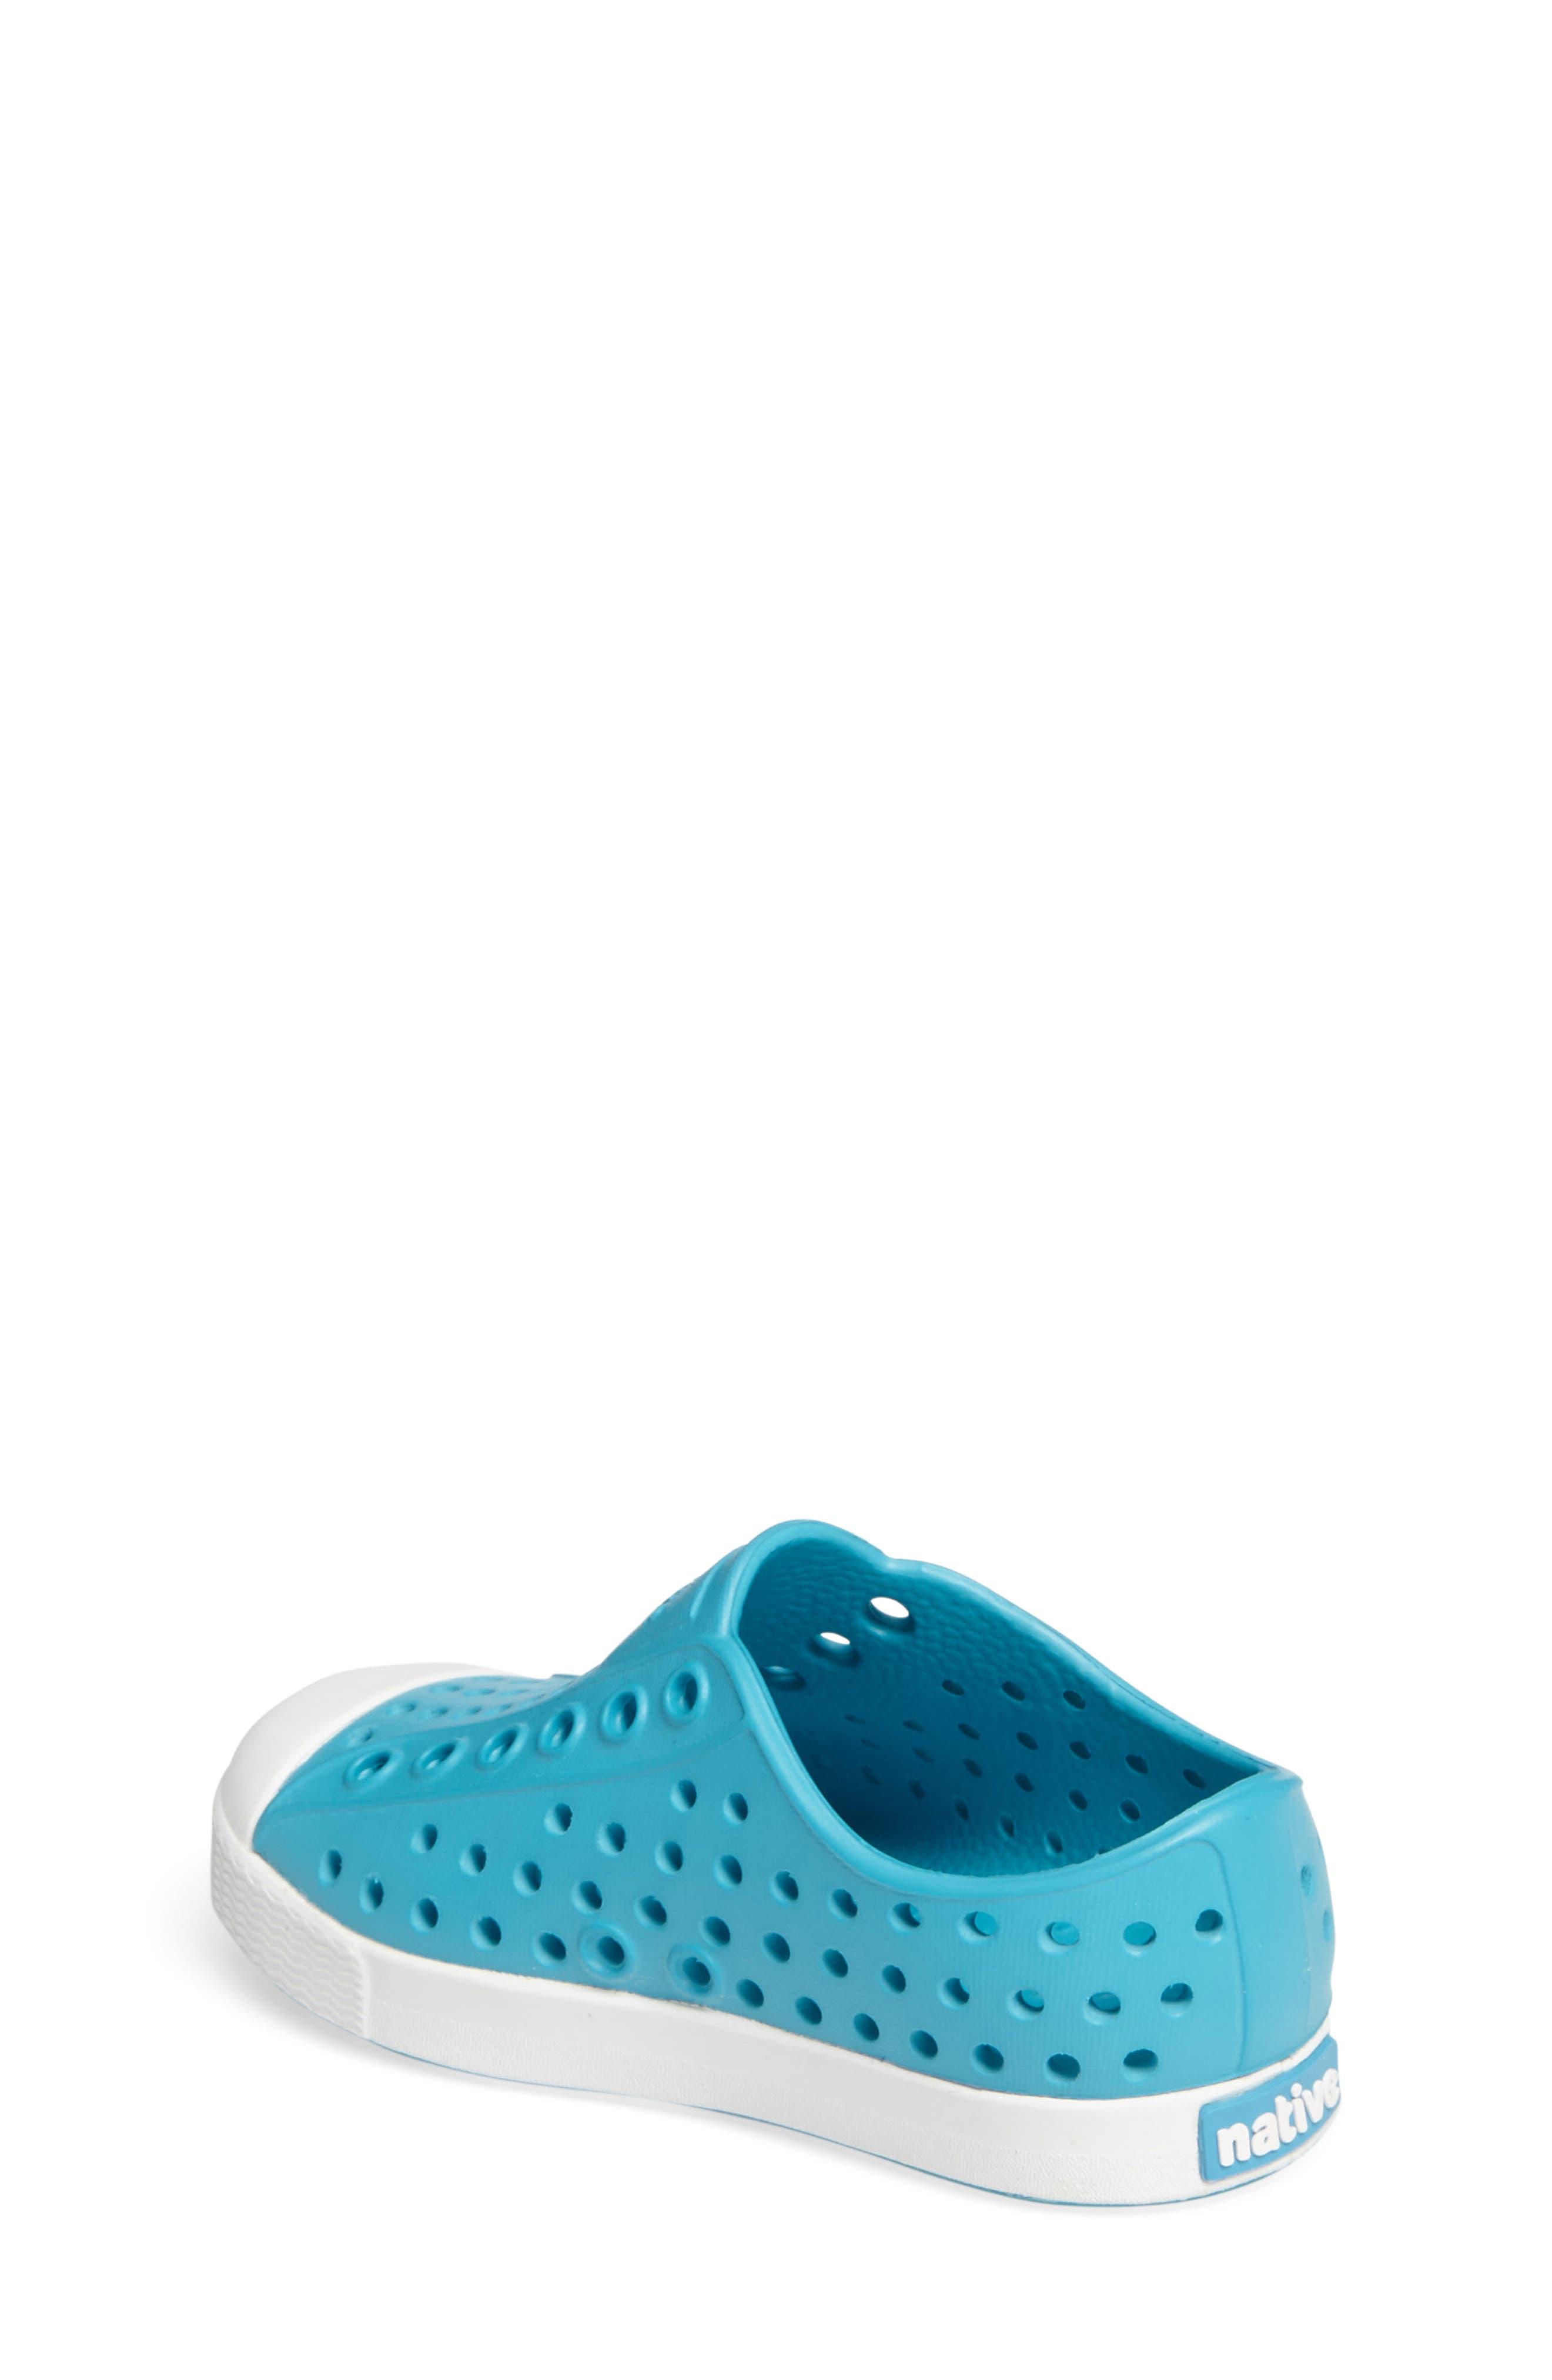 Womens lacoste sandals - Womens Lacoste Sandals 14